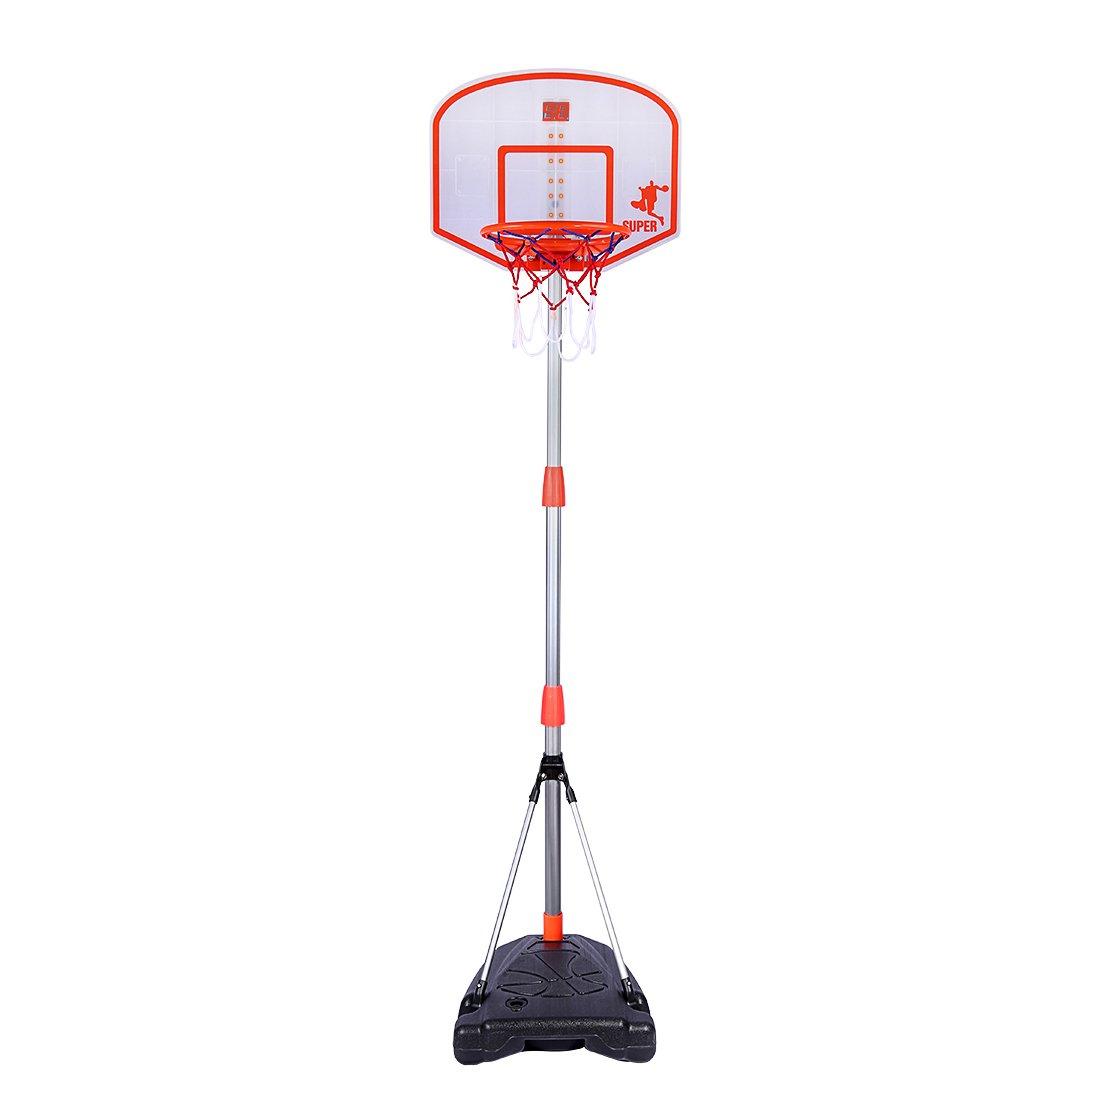 RuiyiF Adjustable Basketball Hoop Kids with Scoreboard, Basketball Portable System -Basketball Stand, Hoop, Basketball 38-67 Inch Height